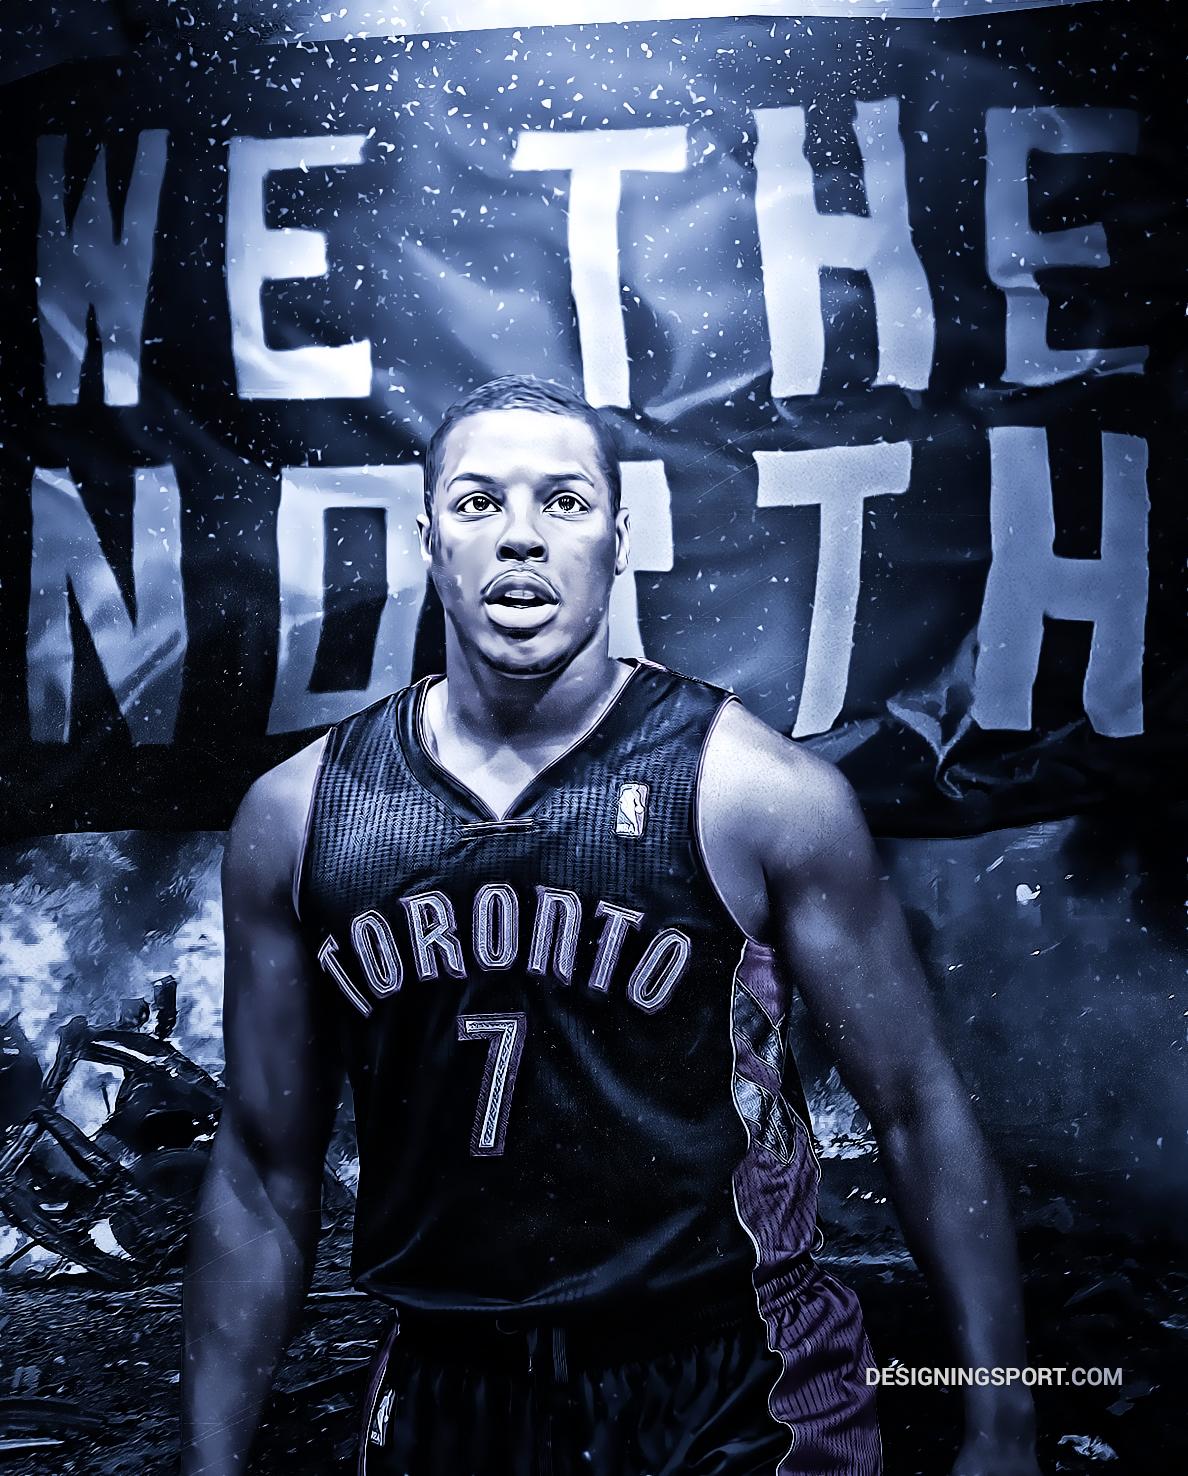 Kyle Lowry Toronto Raptors We the North Sport Art 1188x1476